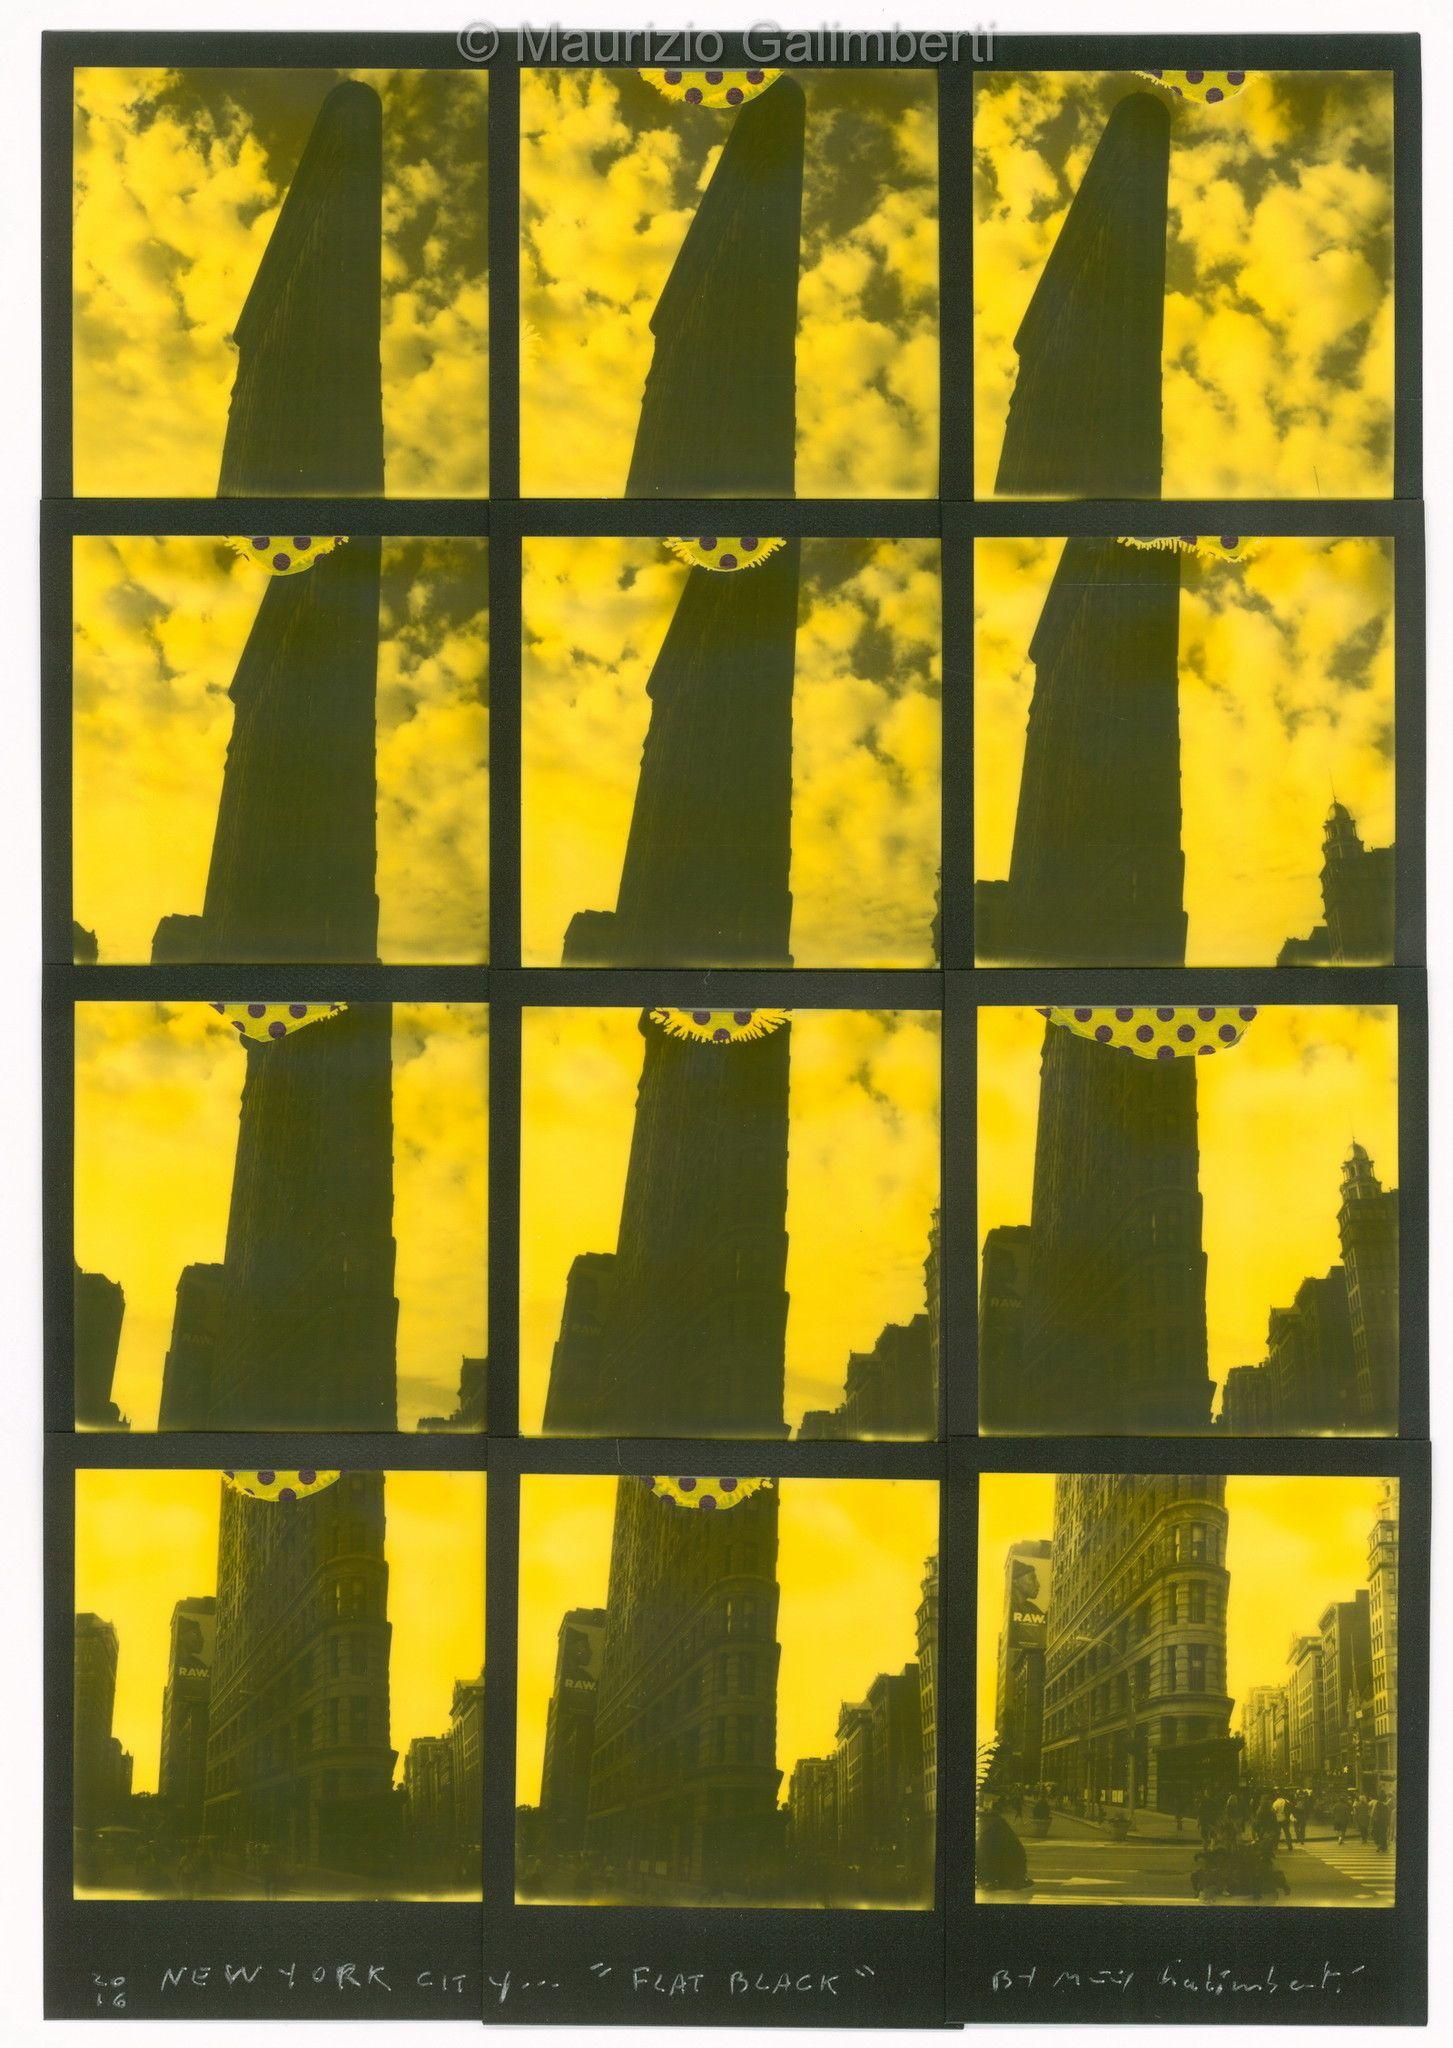 VINTAGE POLAROID MAURIZIO GALIMBERTI 'NEW YORK CITY FLAT BLACK' dimensioni cm. 49x60